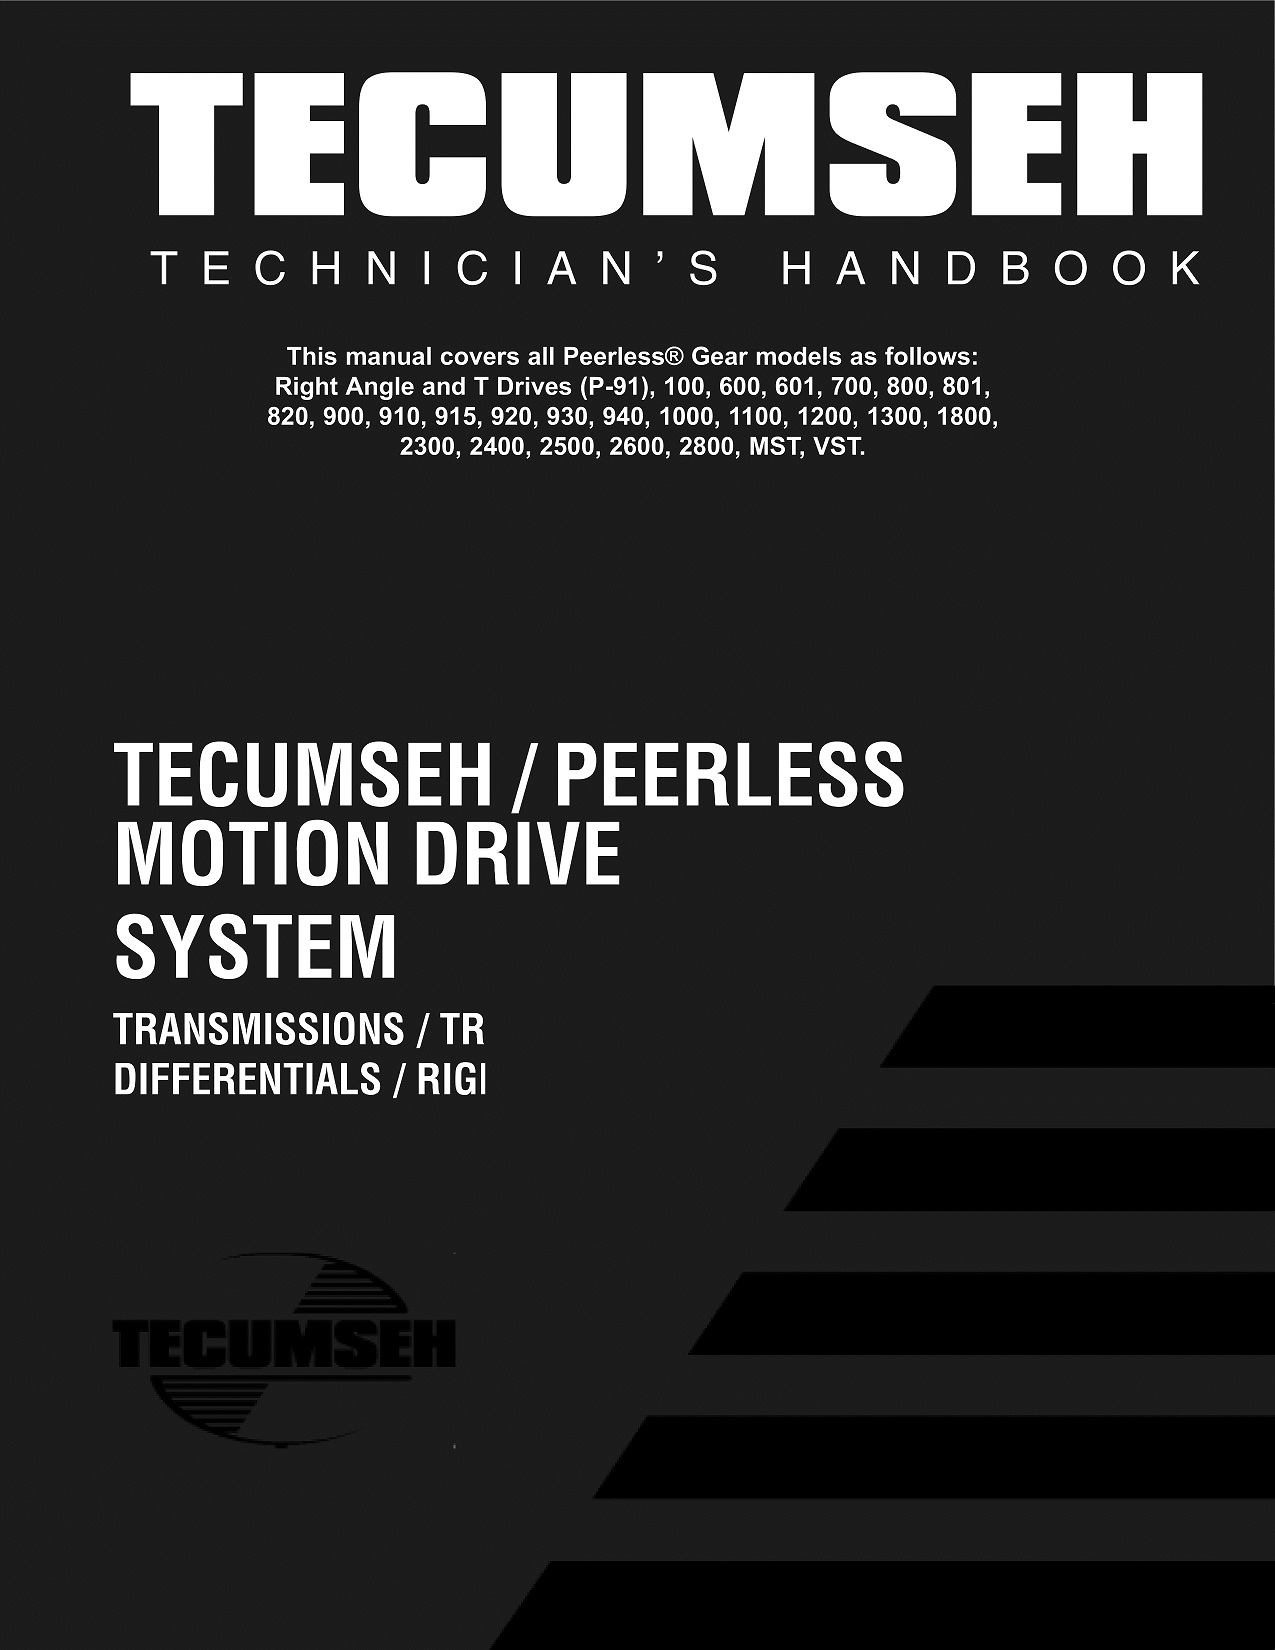 Craftsman LT2000 trans problems - MyTractorForum com - The